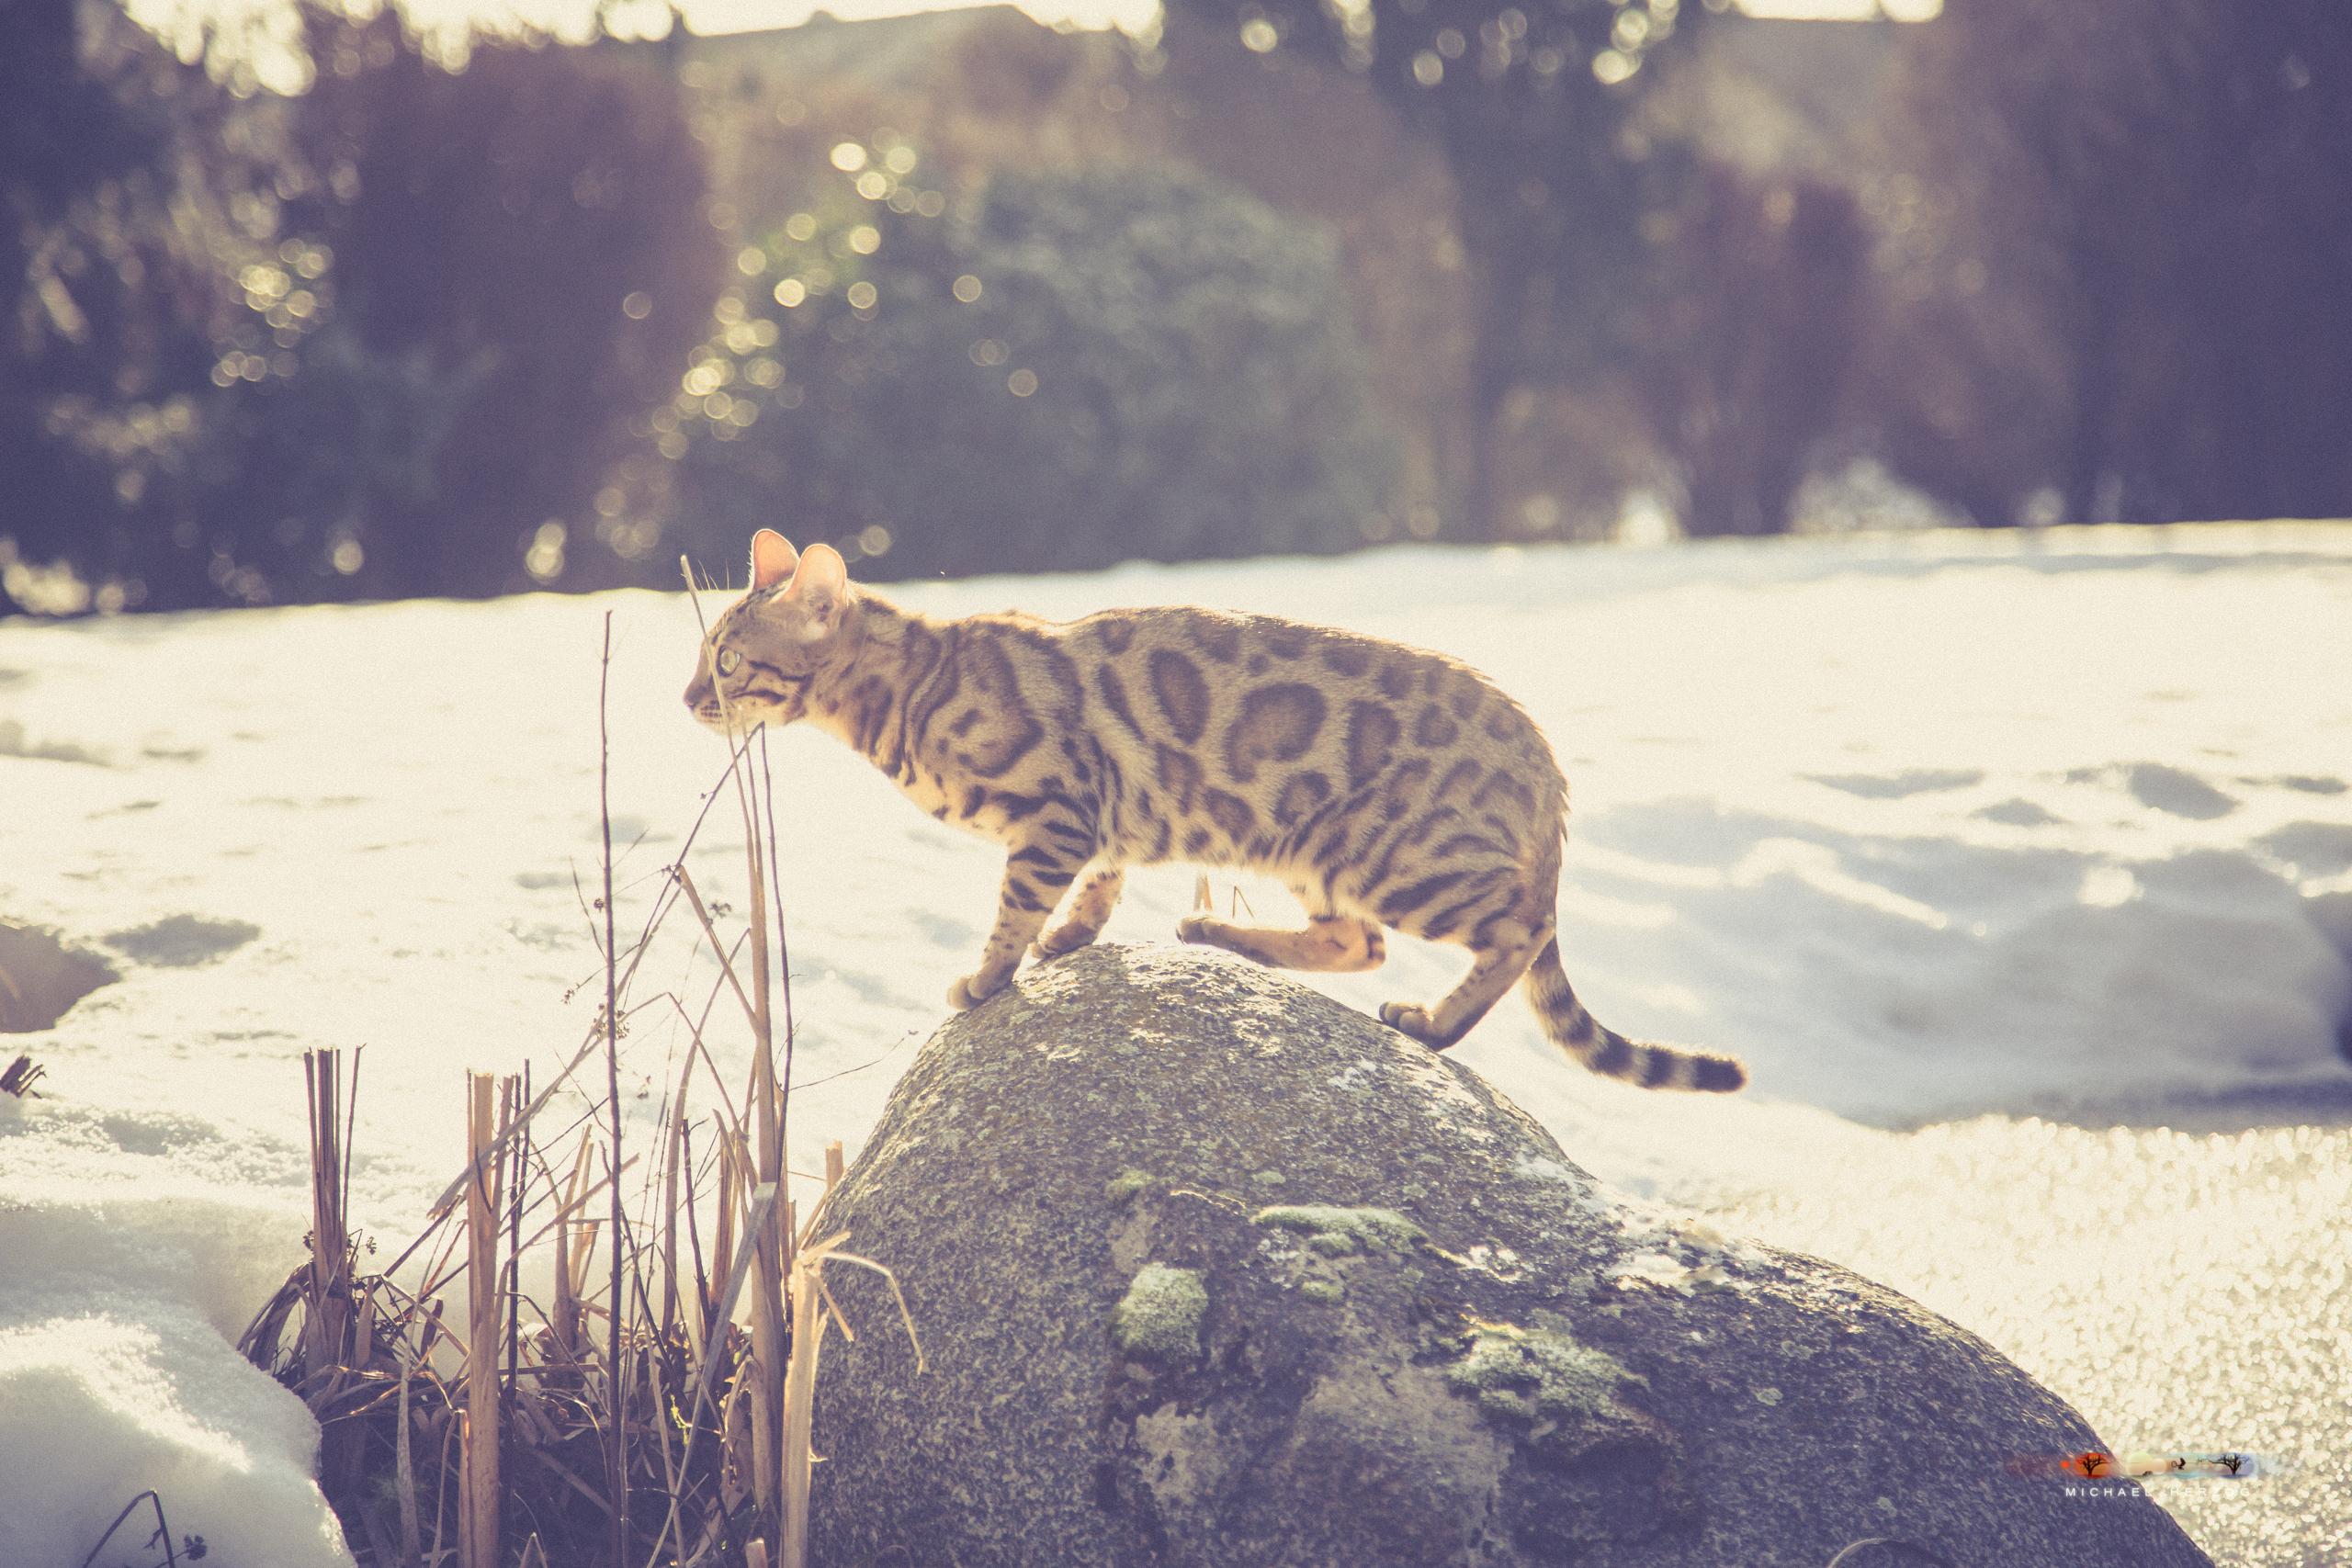 BALUARI_Winter2019_Garten_MichaelHerzog-8741.jpg